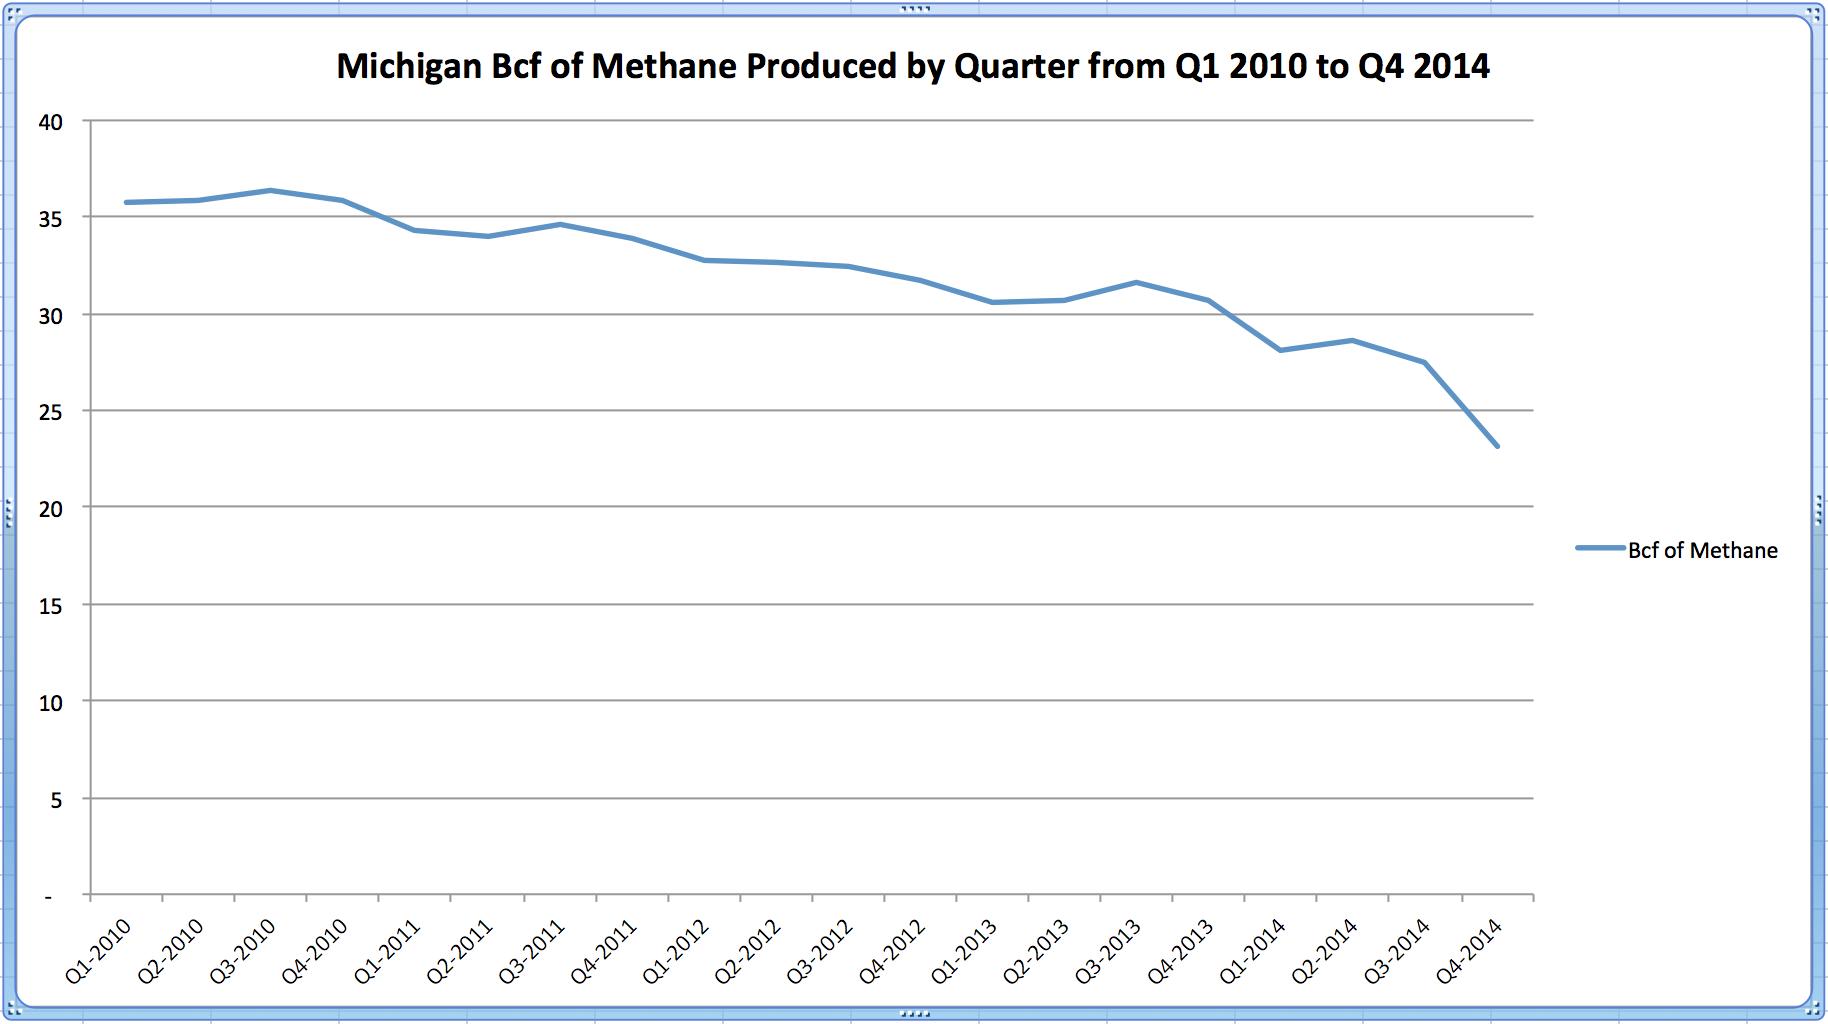 Michigan Natural Gas Production 2010 to 2014